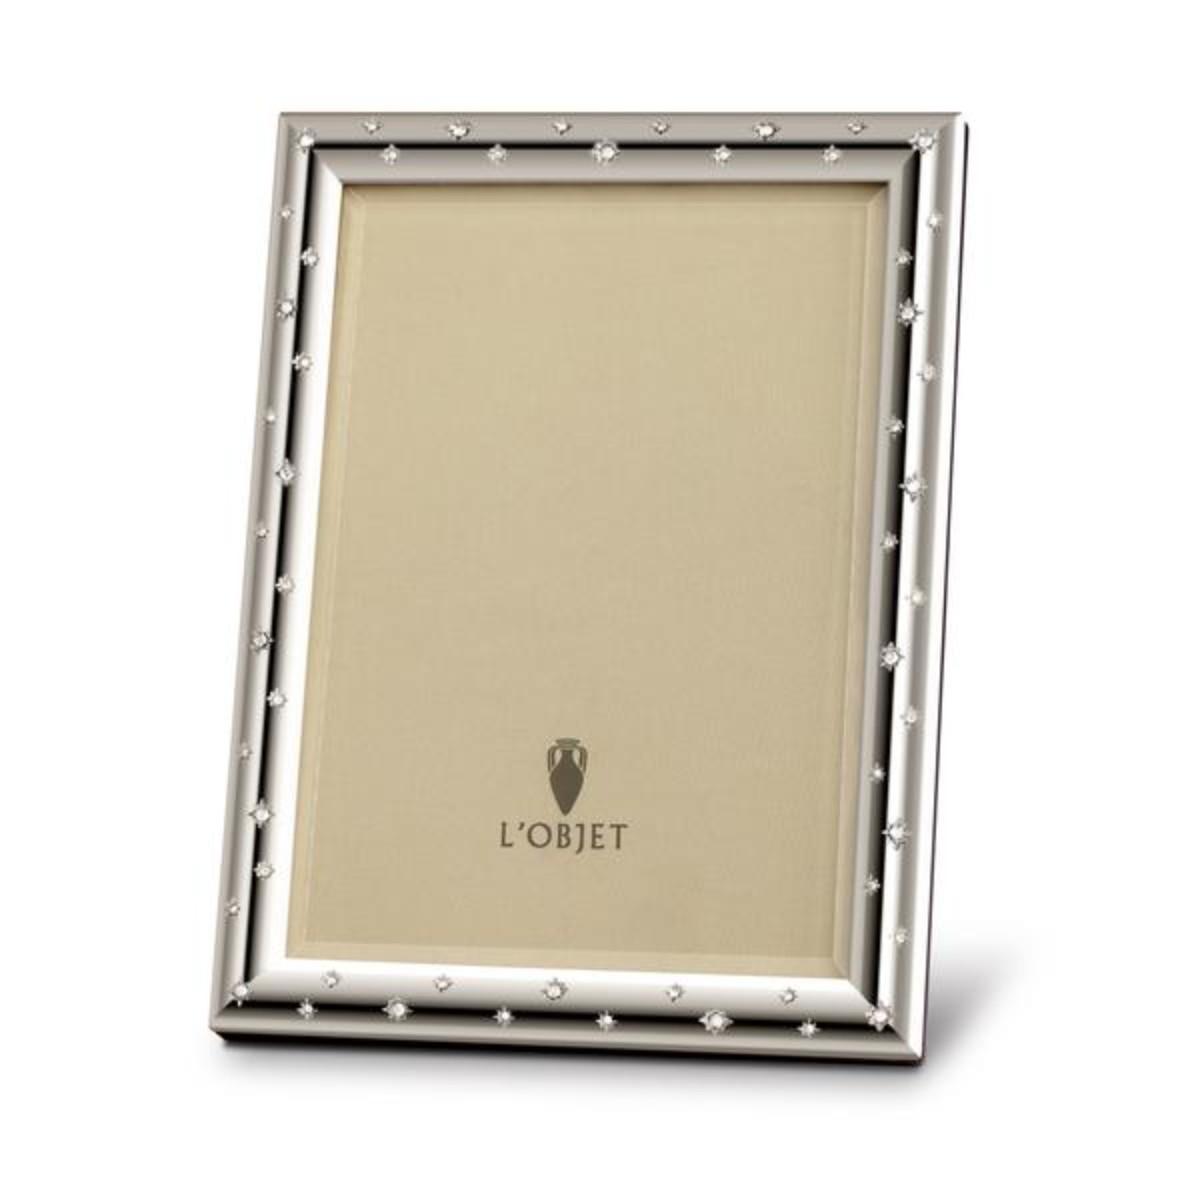 L'Objet I Stars Frame Large I Platinum and white Crystals